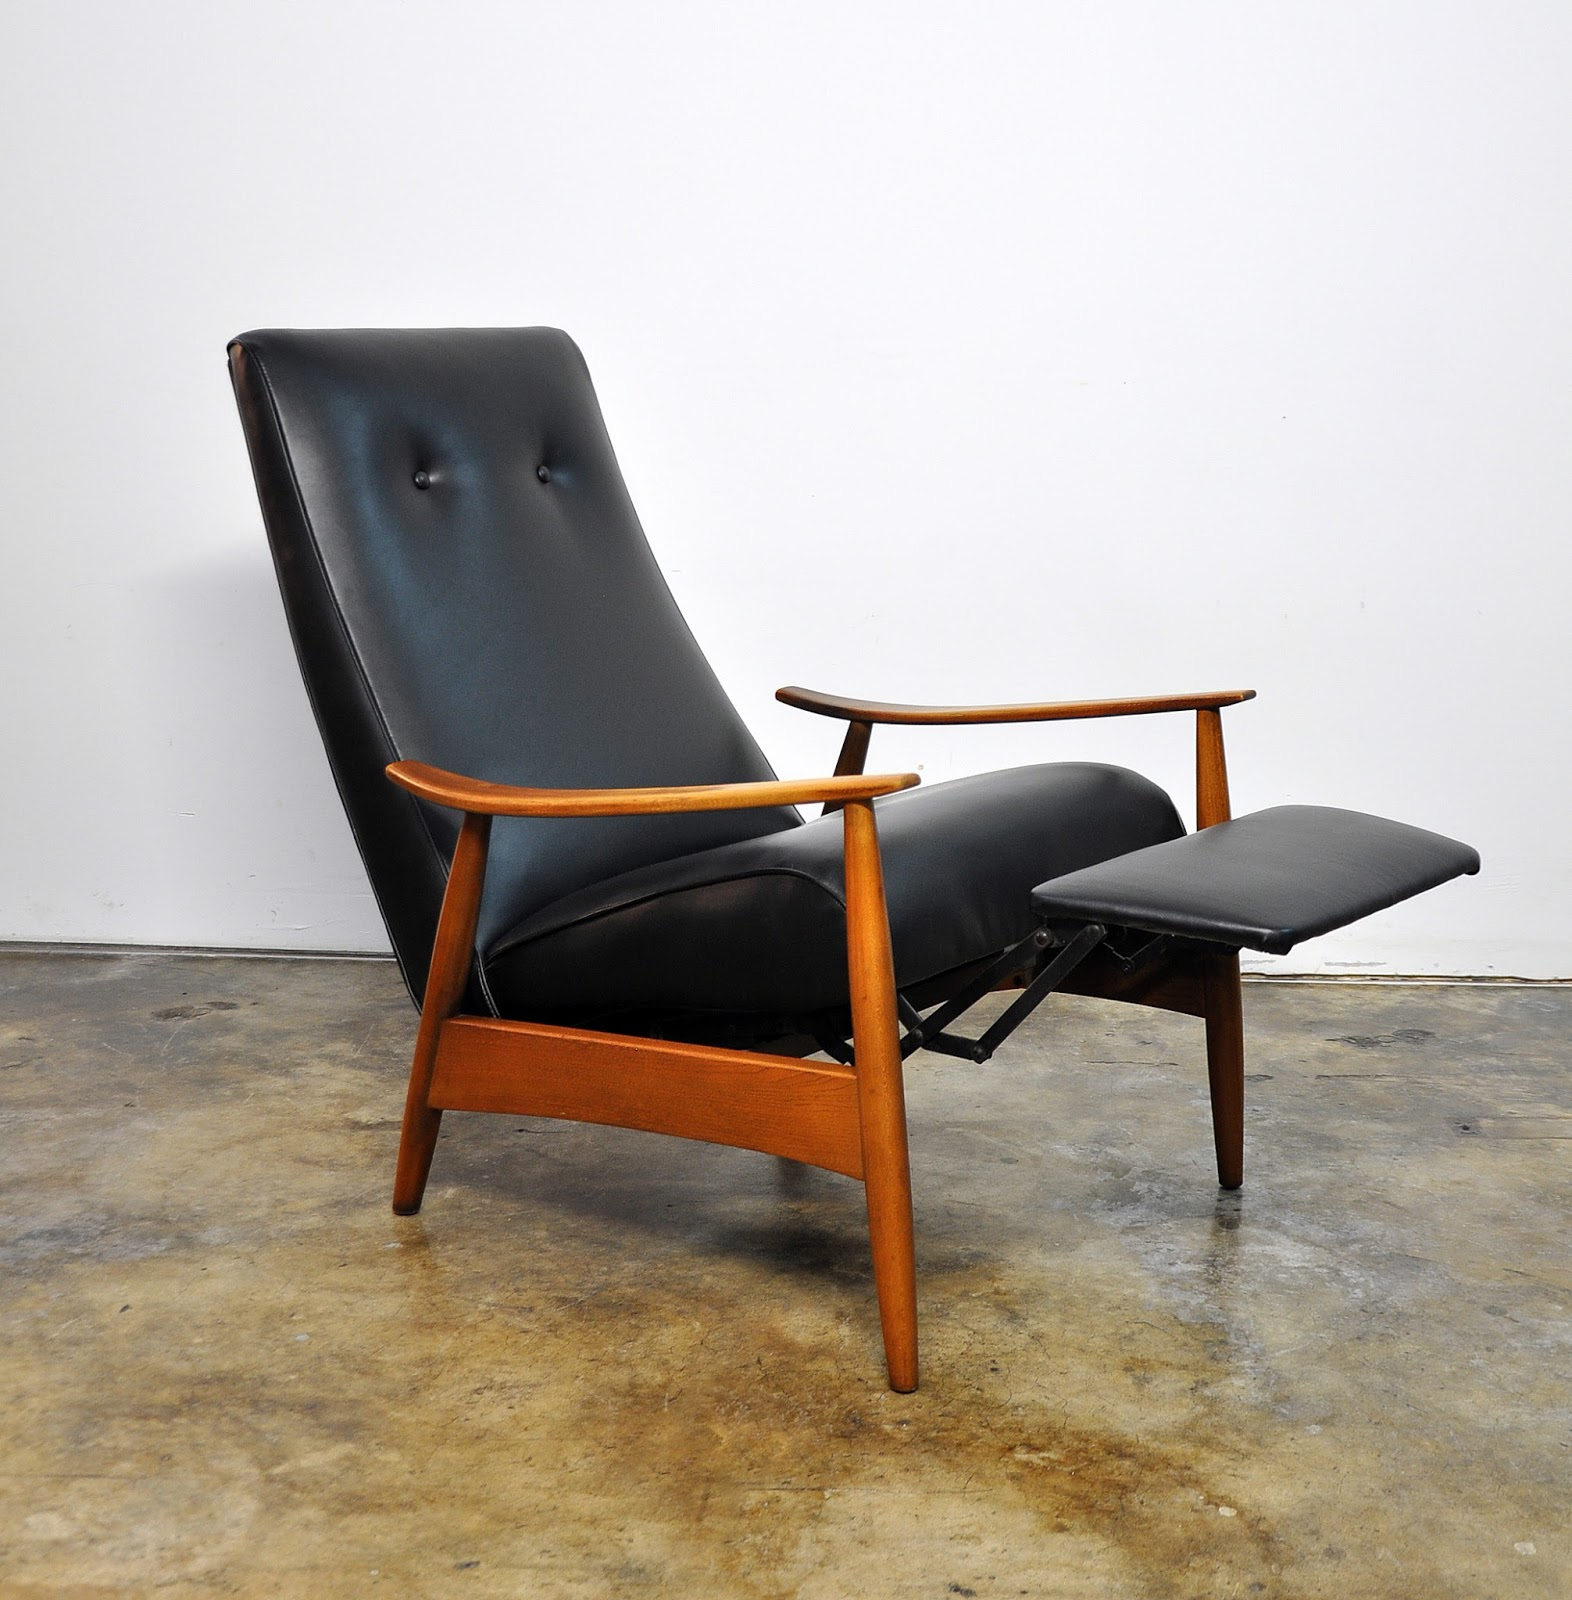 Chairs Furniture: SELECT MODERN: Milo Baughman Recliner 74 Lounge Chair